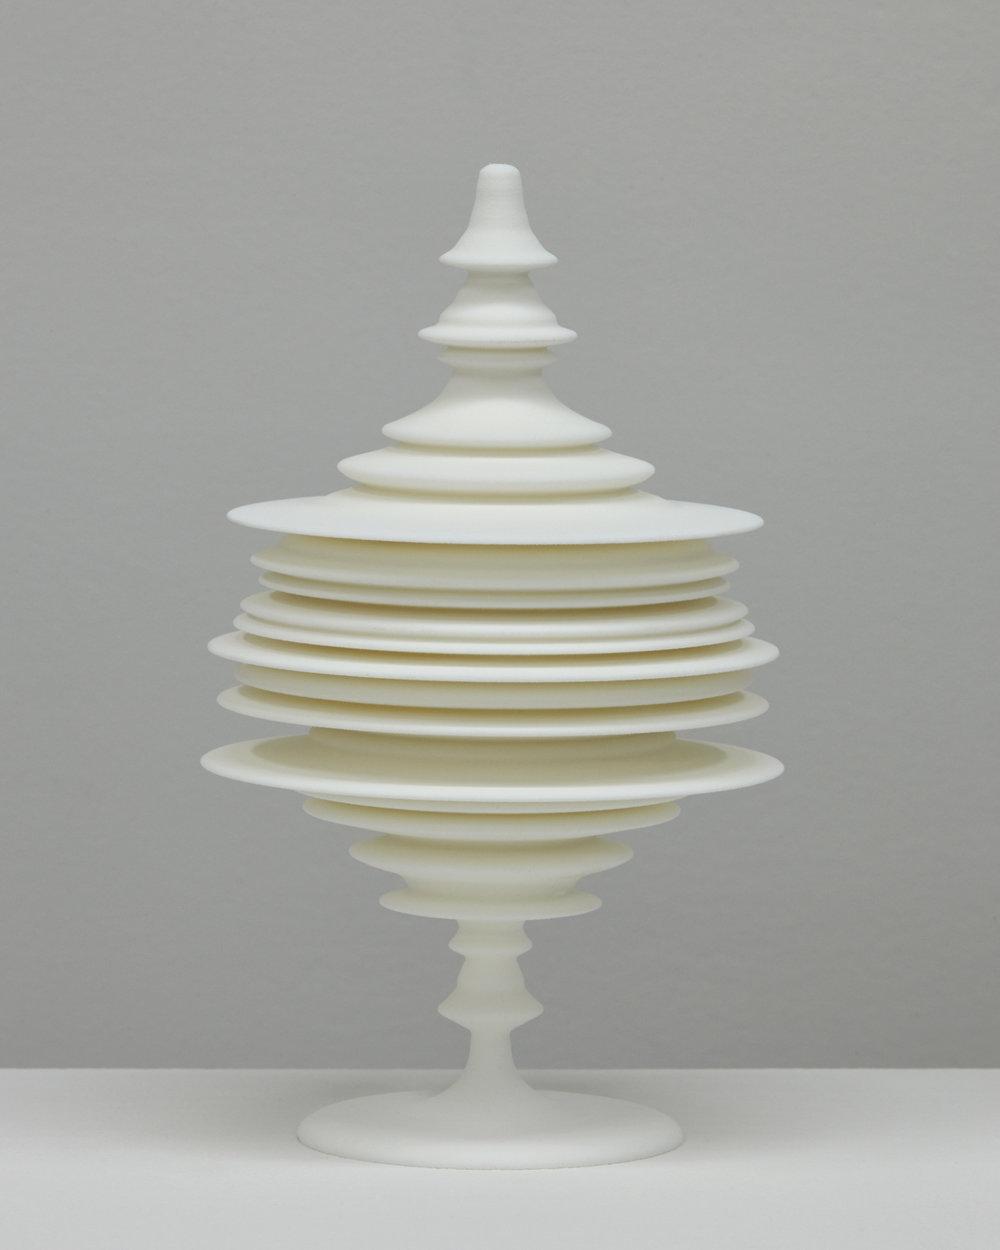 "Laura Splan, ""Manifest (Smile),"" 2015, Laser sintered polyamide nylon, 8 x 4.75 x 4.75 inches, edition of 5 plus one artist proof"